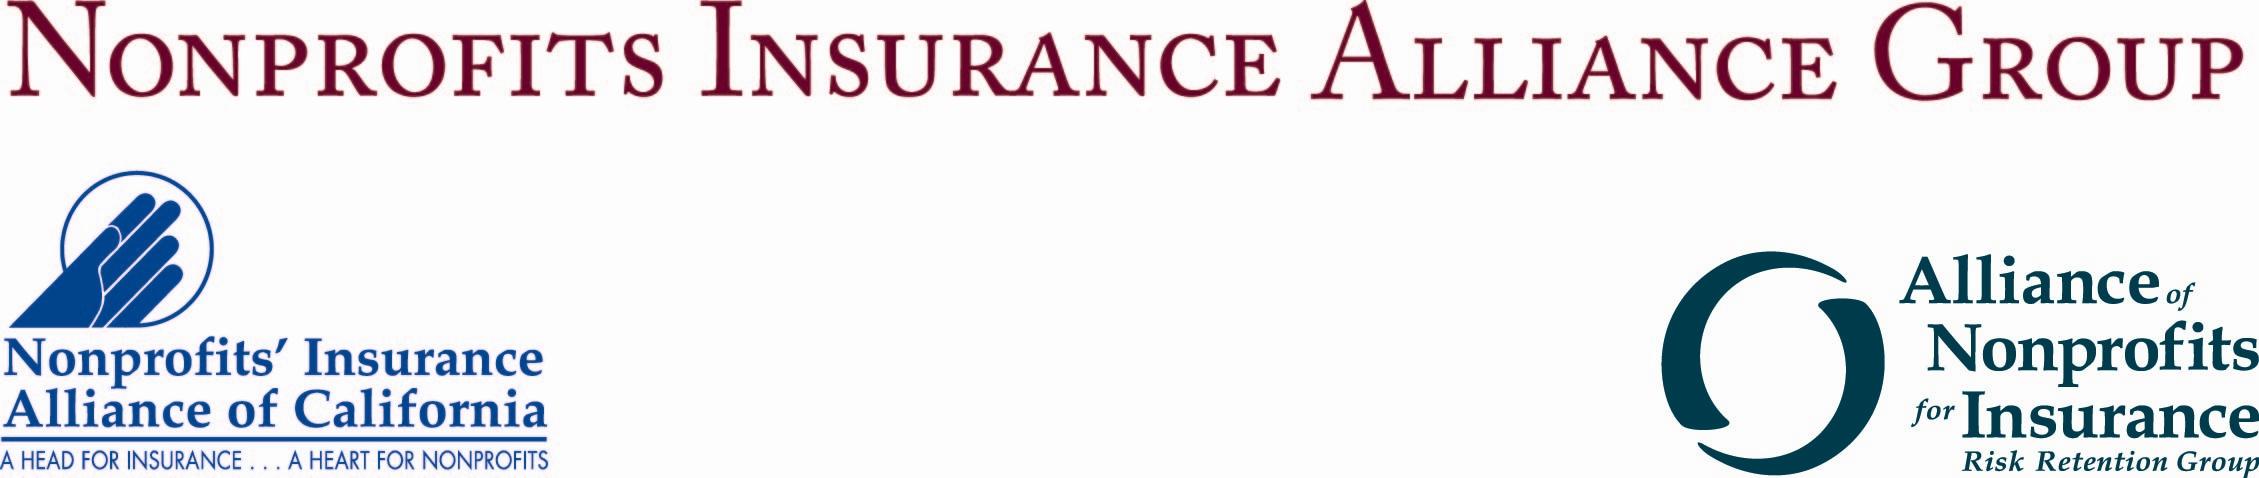 Nonprofits' Insurance Alliance of California logo